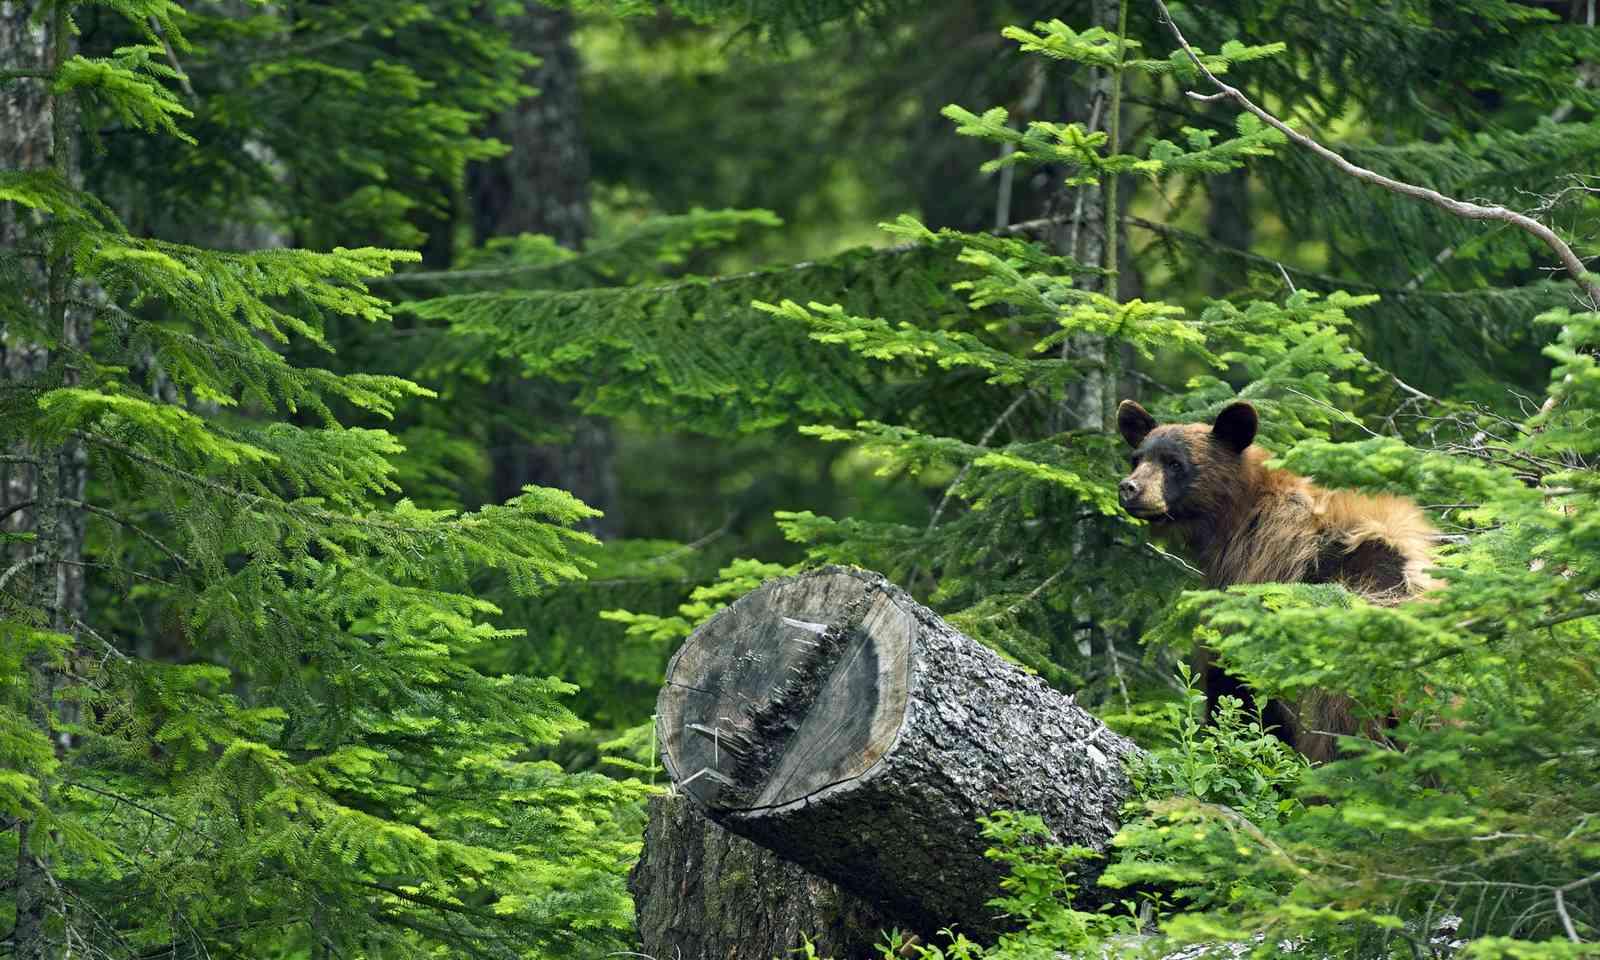 Bear in the wild in British Columbia (Shutterstock.com)